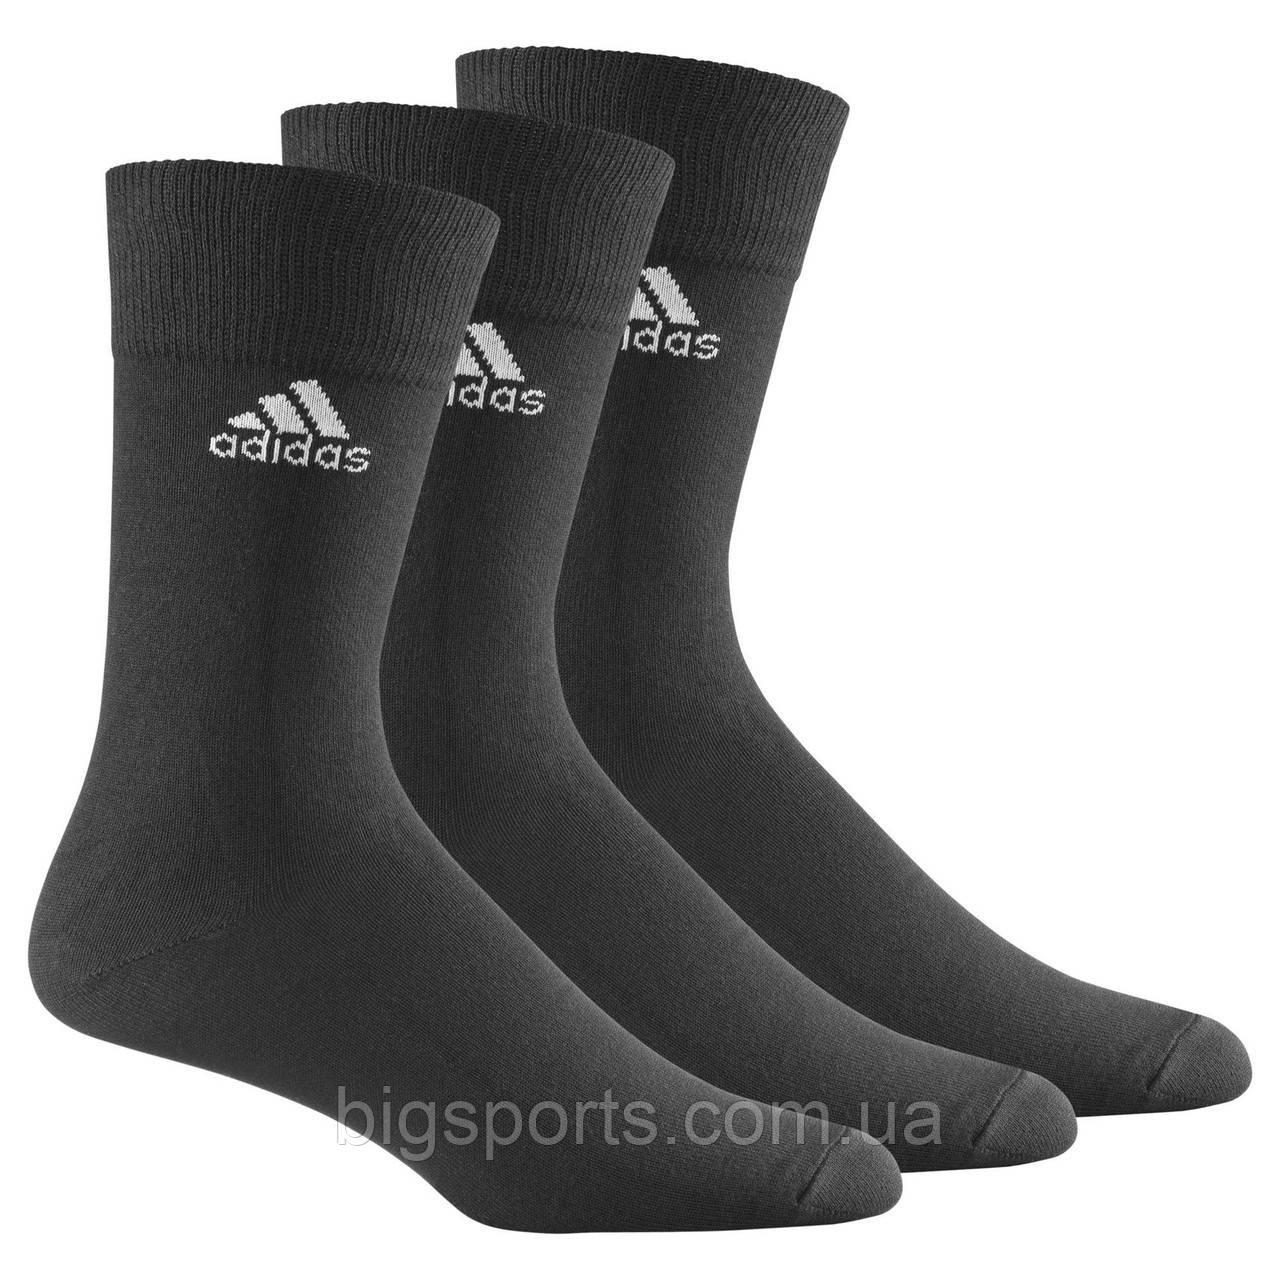 Носки Adidas 3в1 (арт.Z25574)